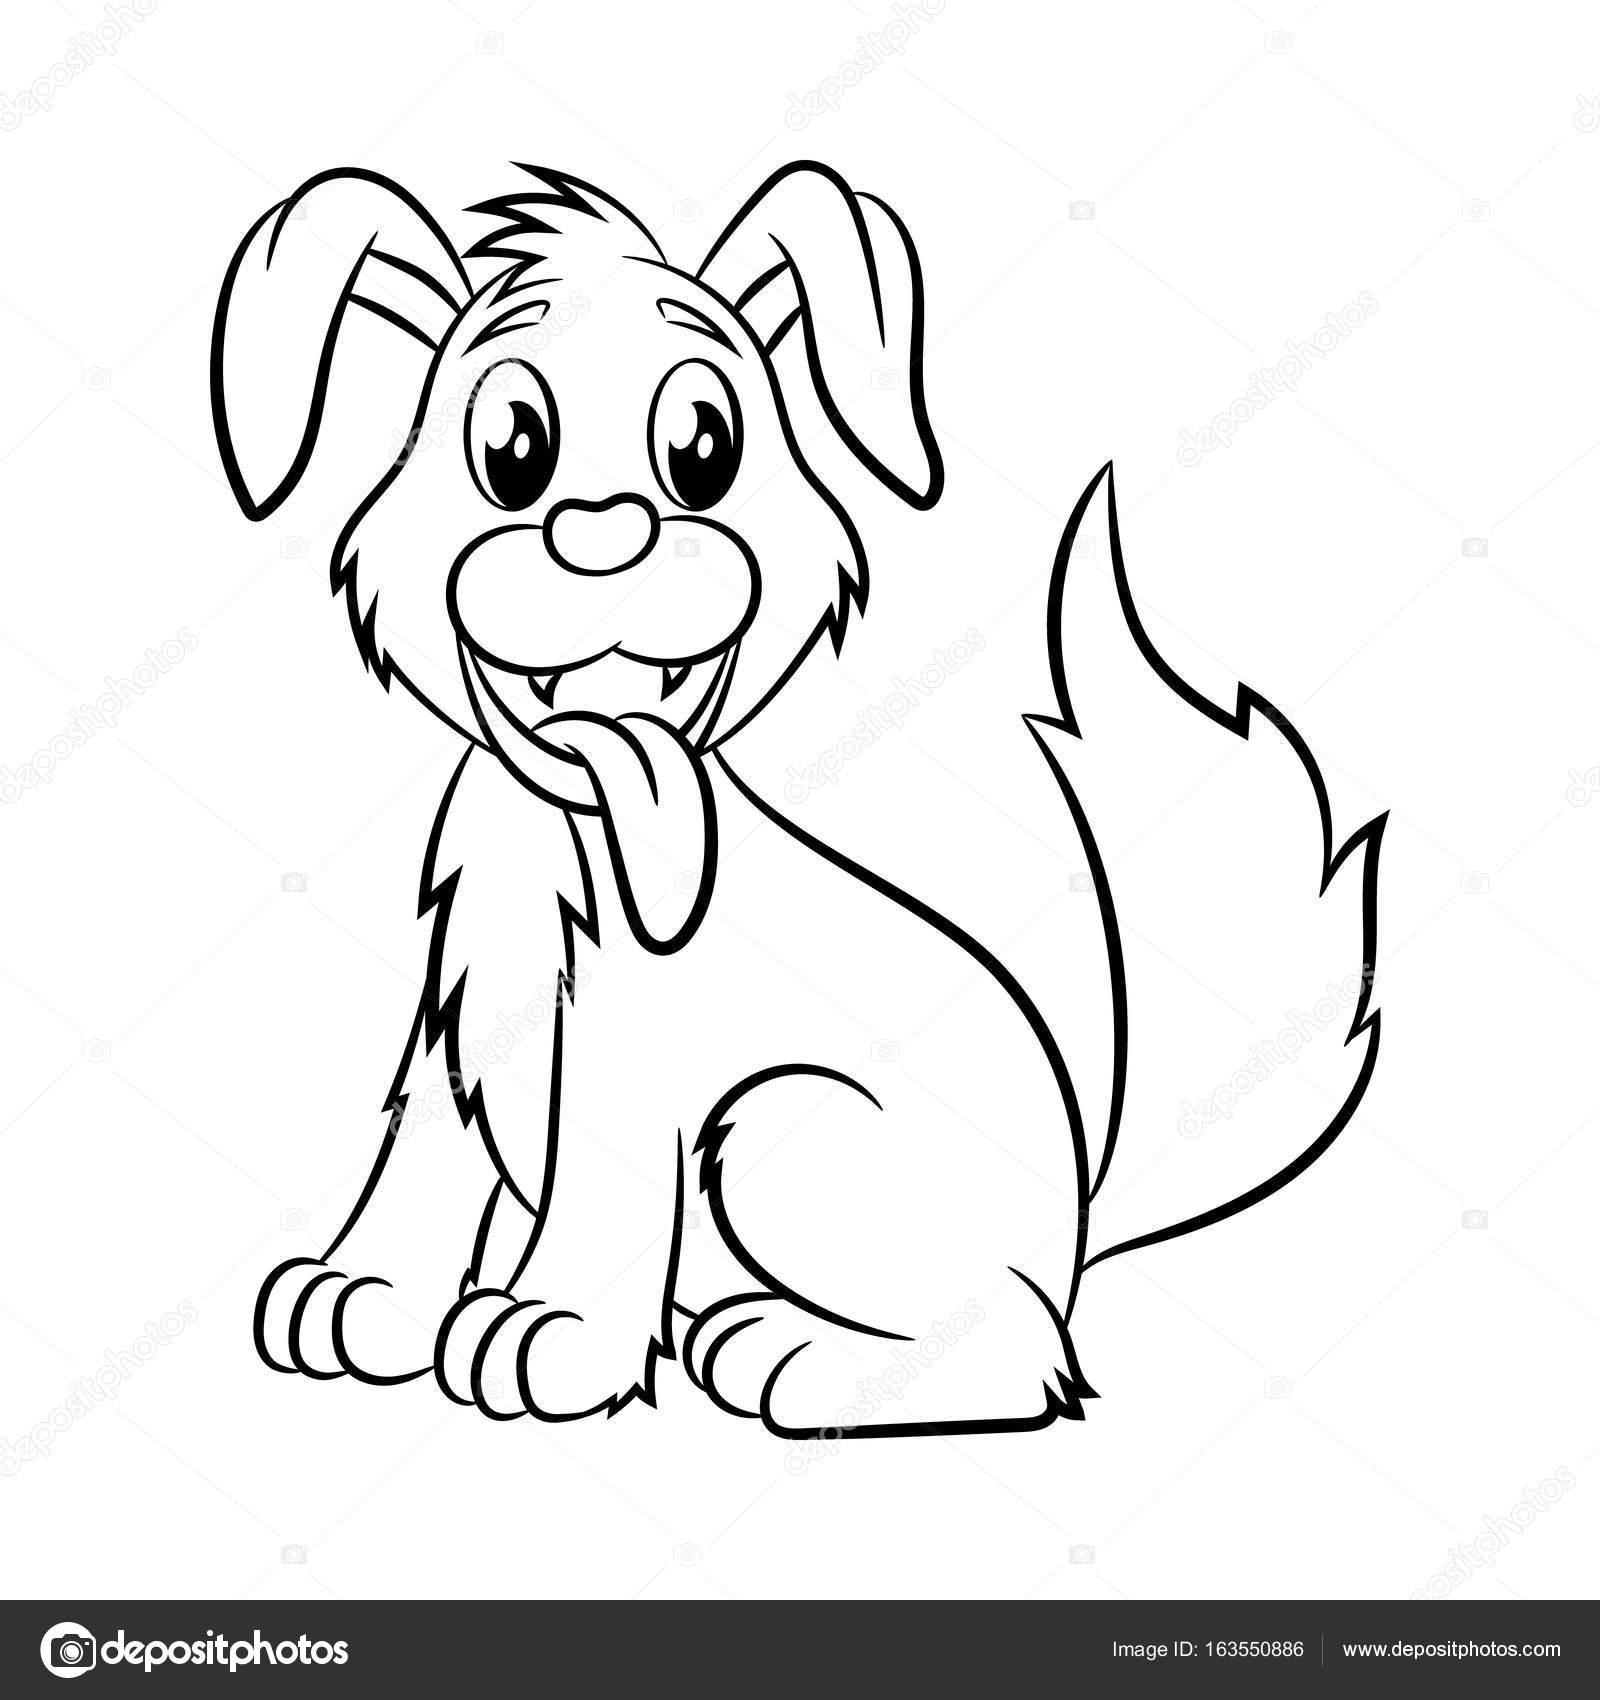 Dog coloring book. — Stock Vector © ismagilovilnaz999 #163550886